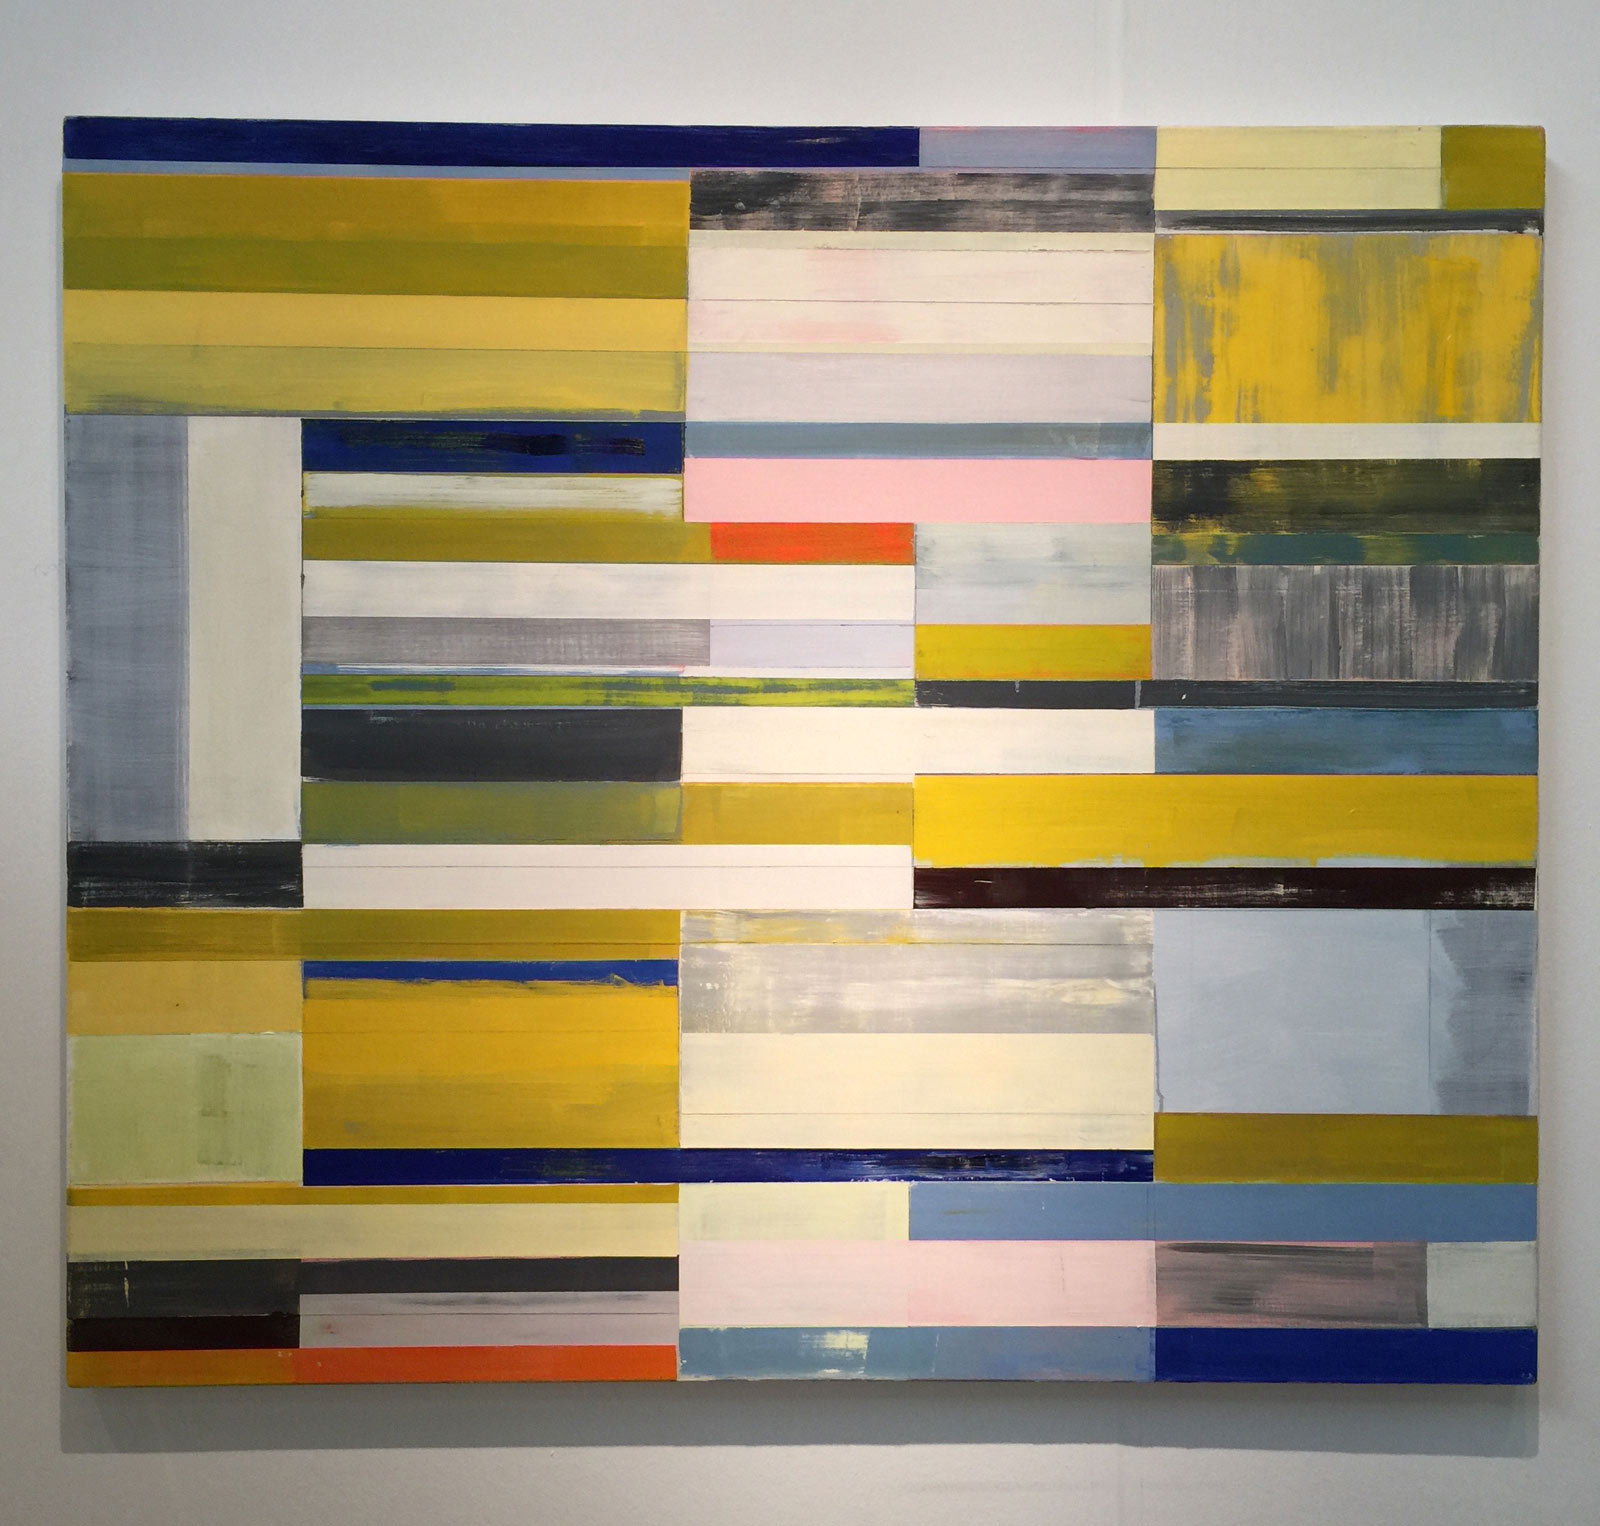 Lloyd-Martin-Collate-oil-canvas-Cynthia-Reeves.jpg